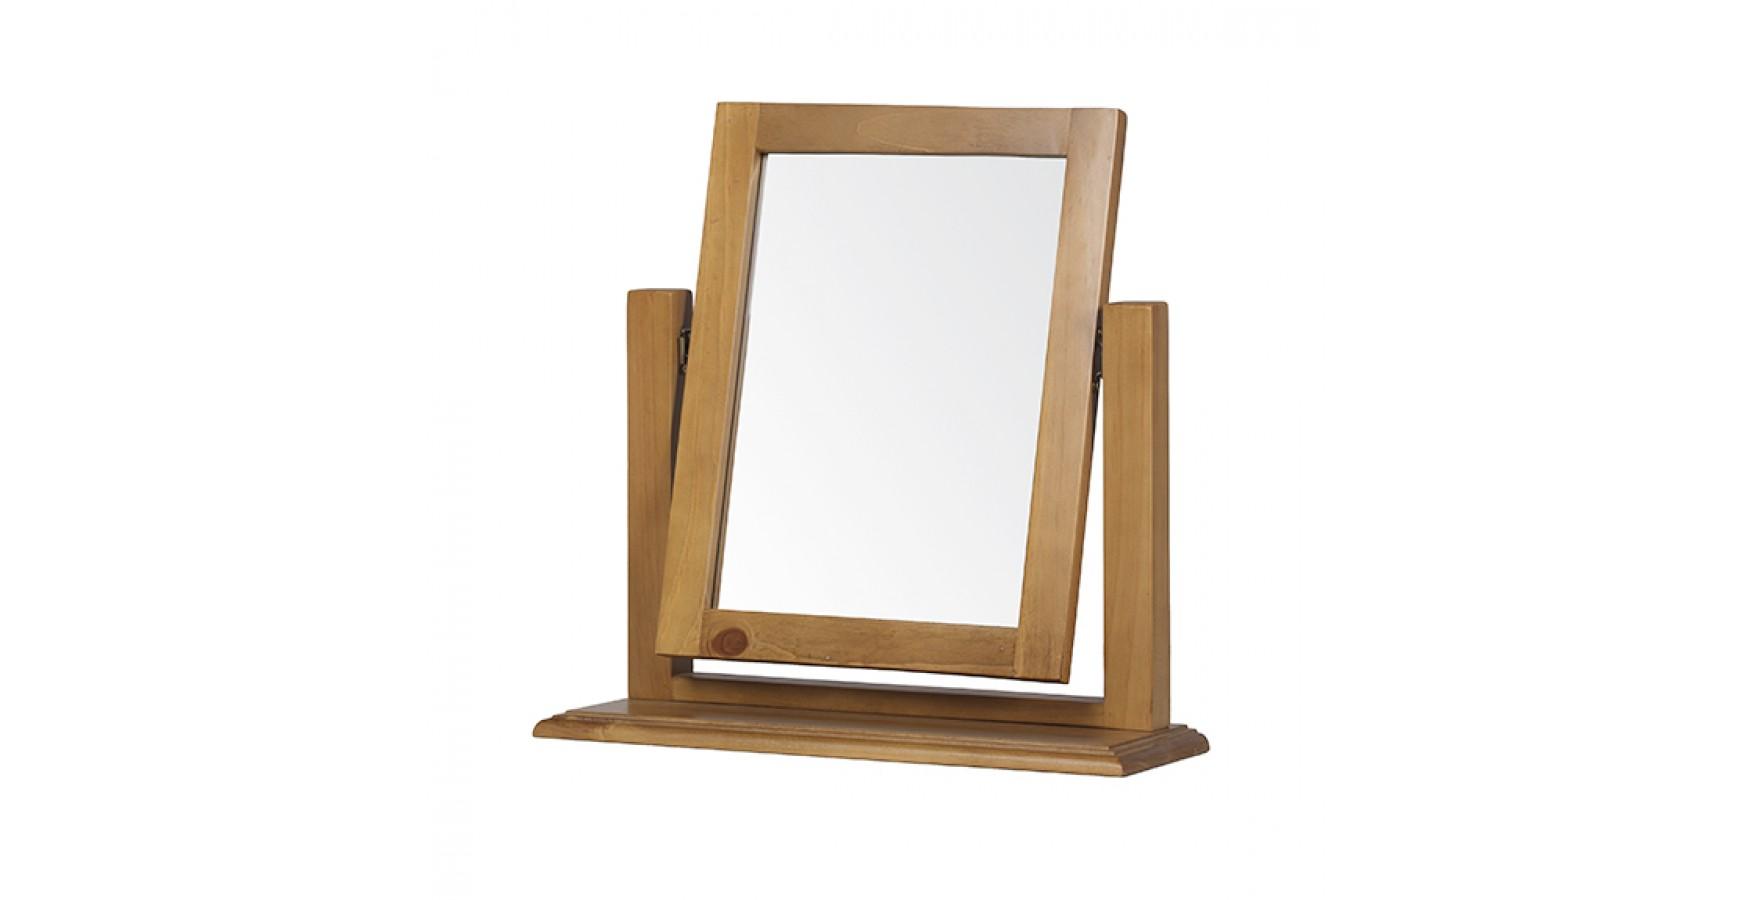 Country pine dressing table vanity mirror lifestyle for Vanity dressing table with mirror